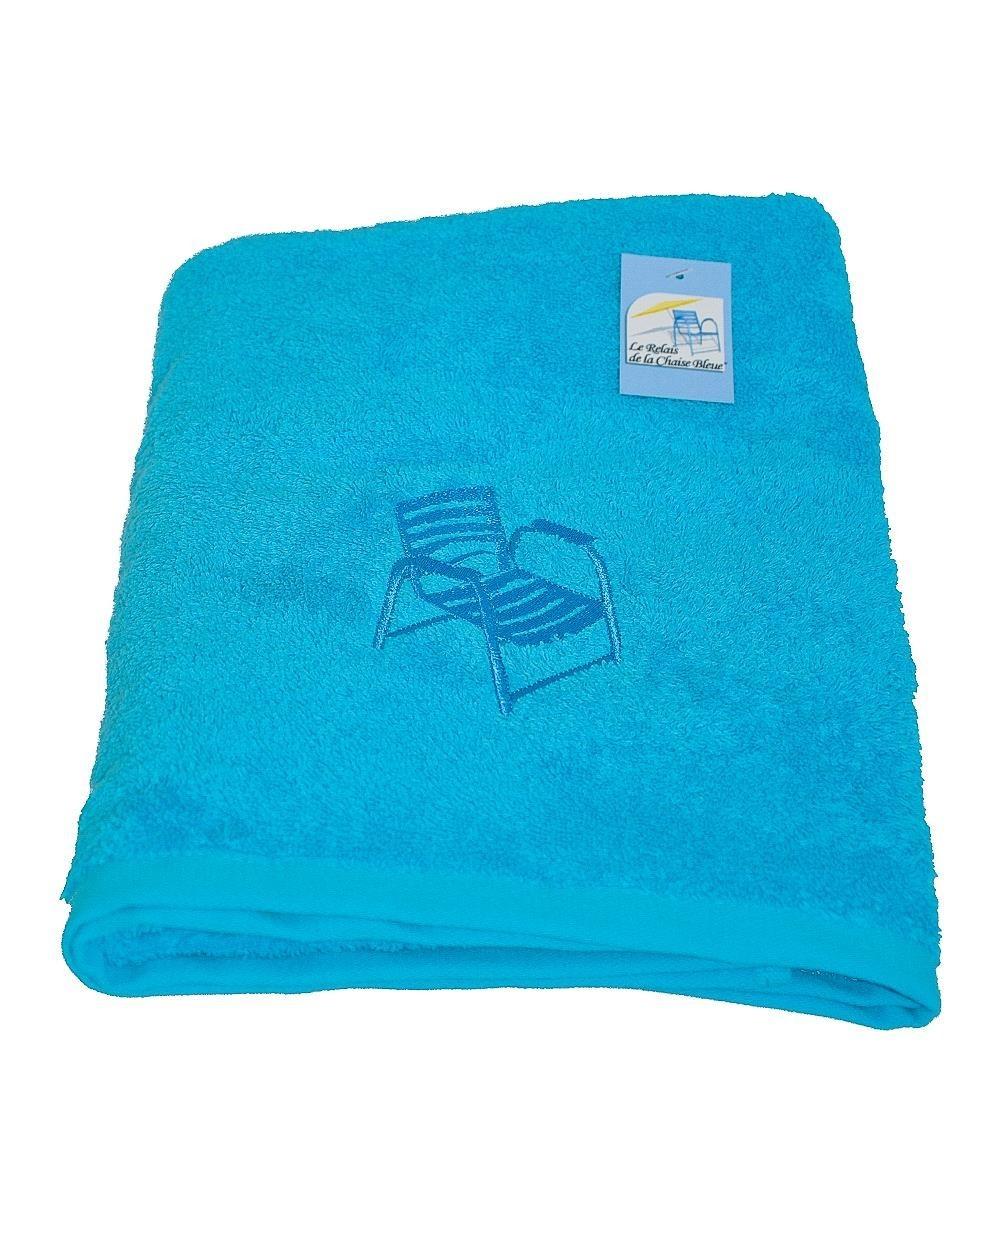 drap de bain bleu 70x140 cm. Black Bedroom Furniture Sets. Home Design Ideas